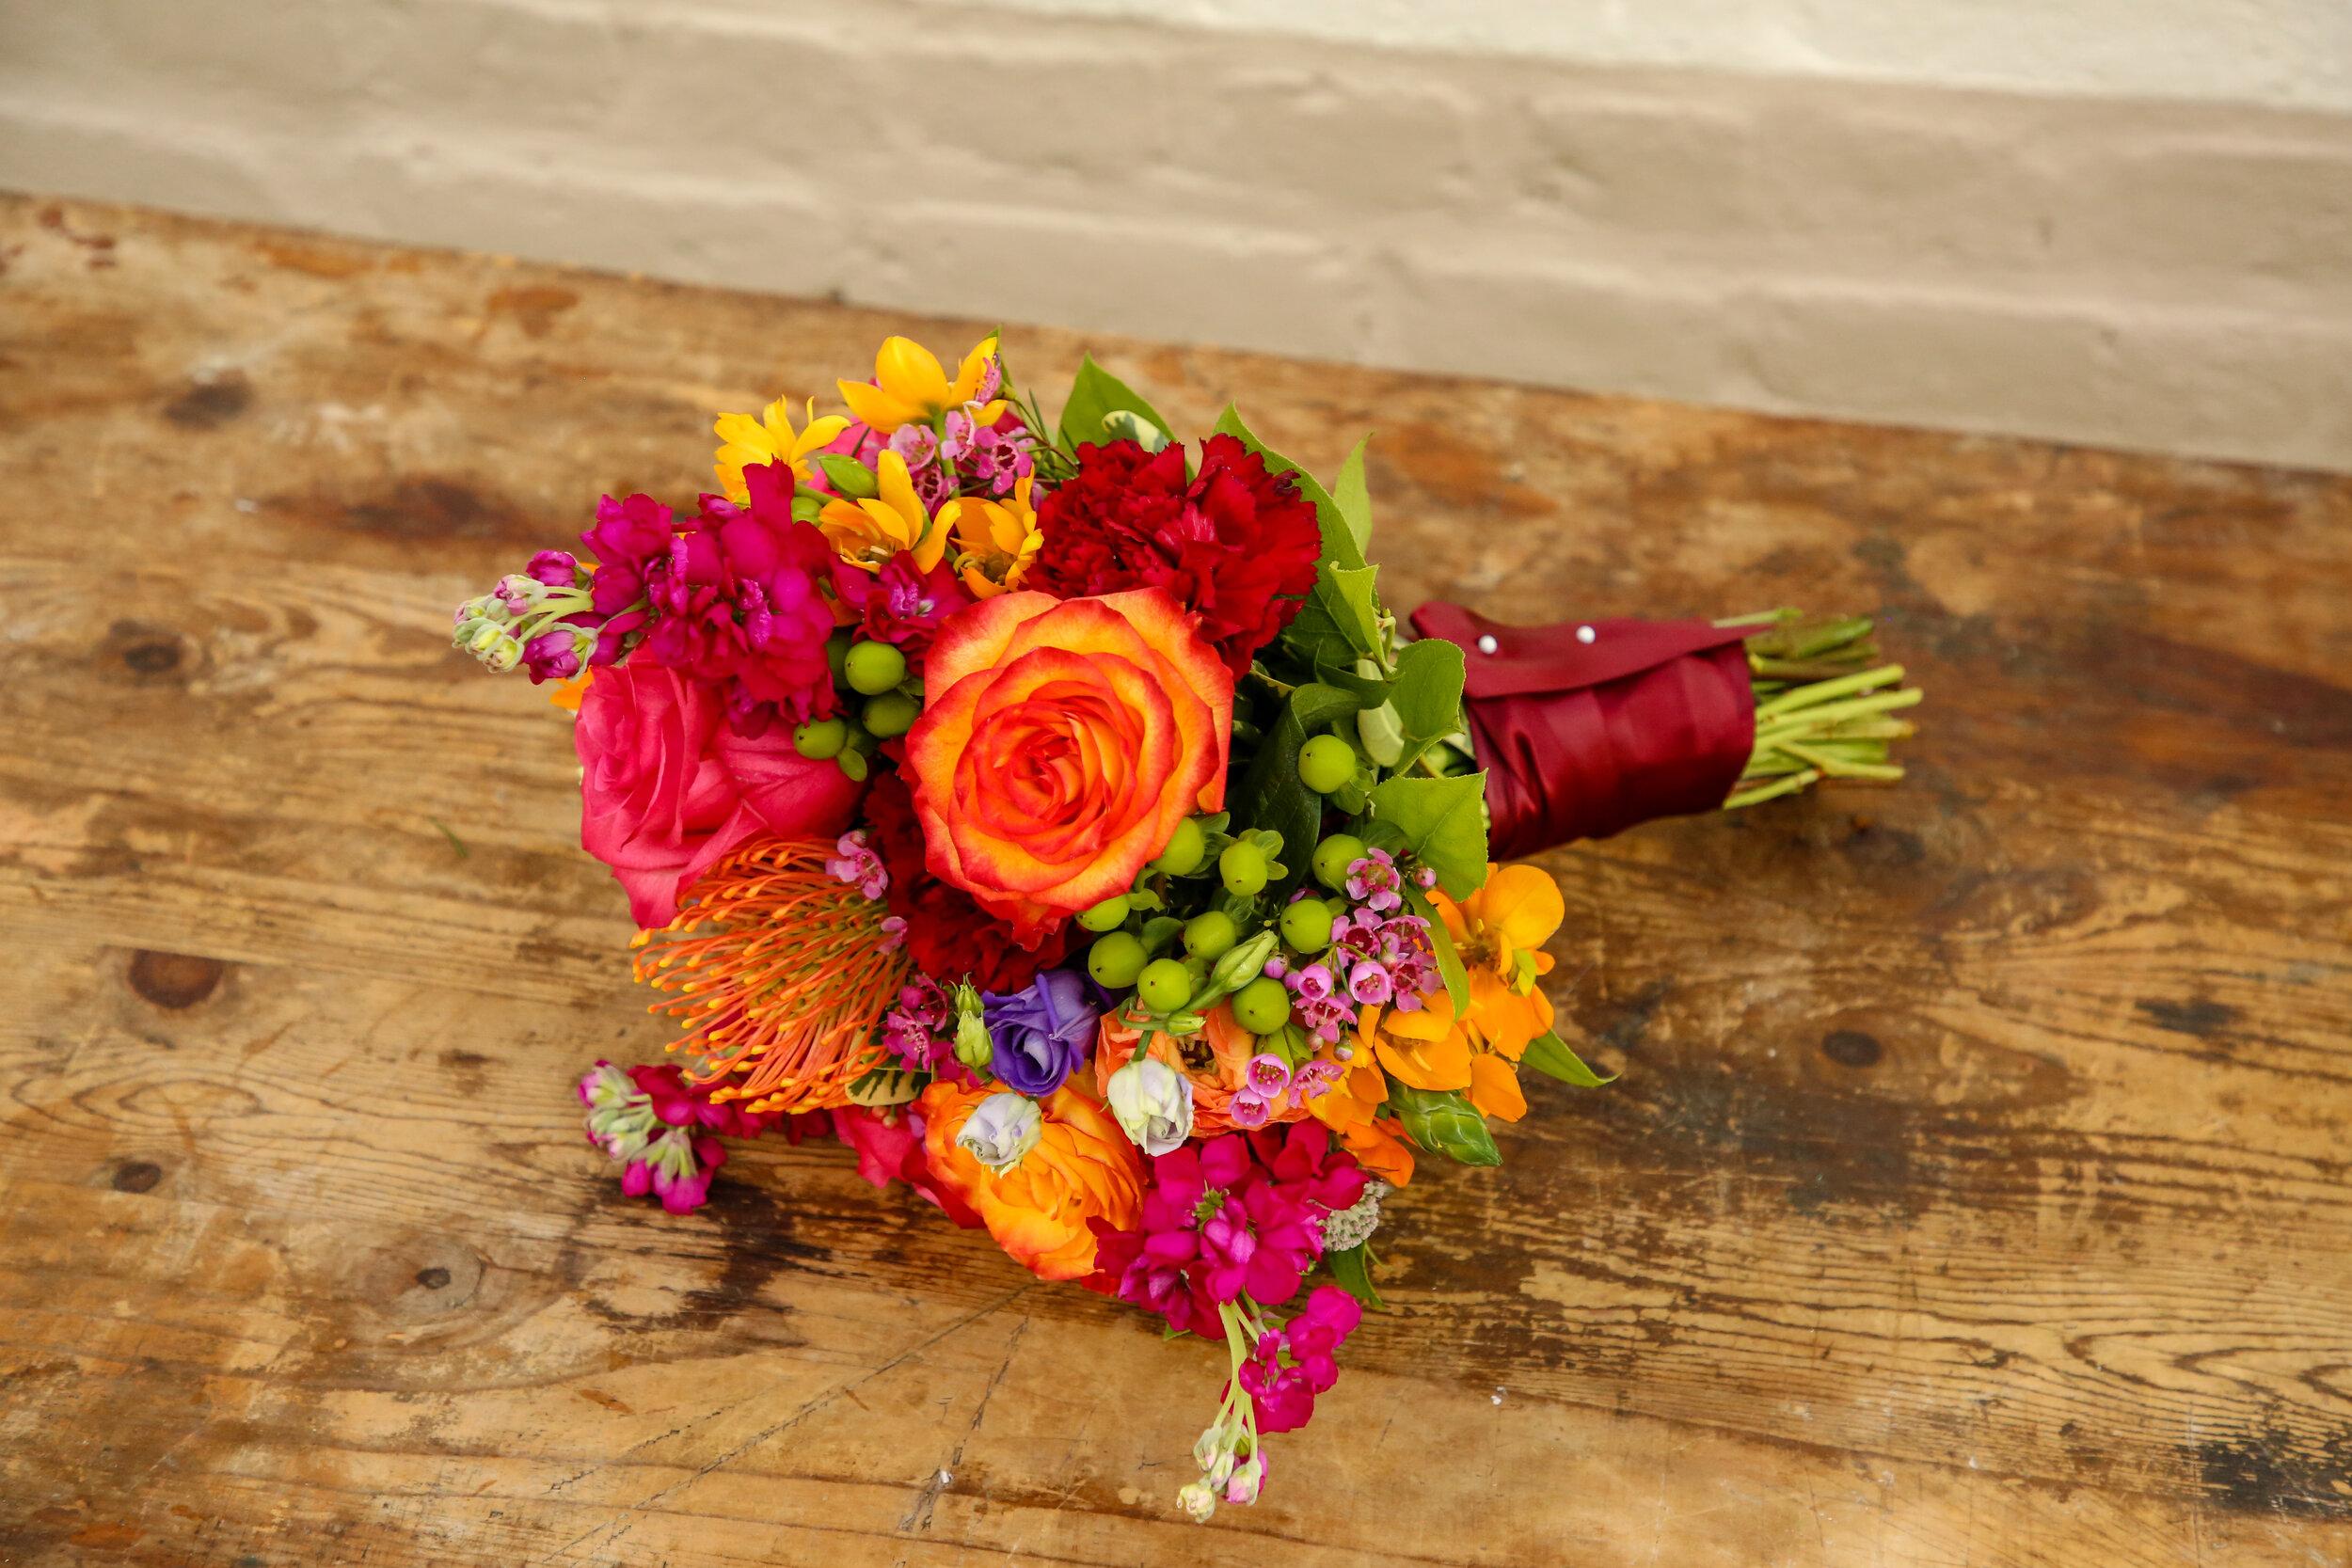 Palate_Flower+BarShoot_Aug282019-19.jpg